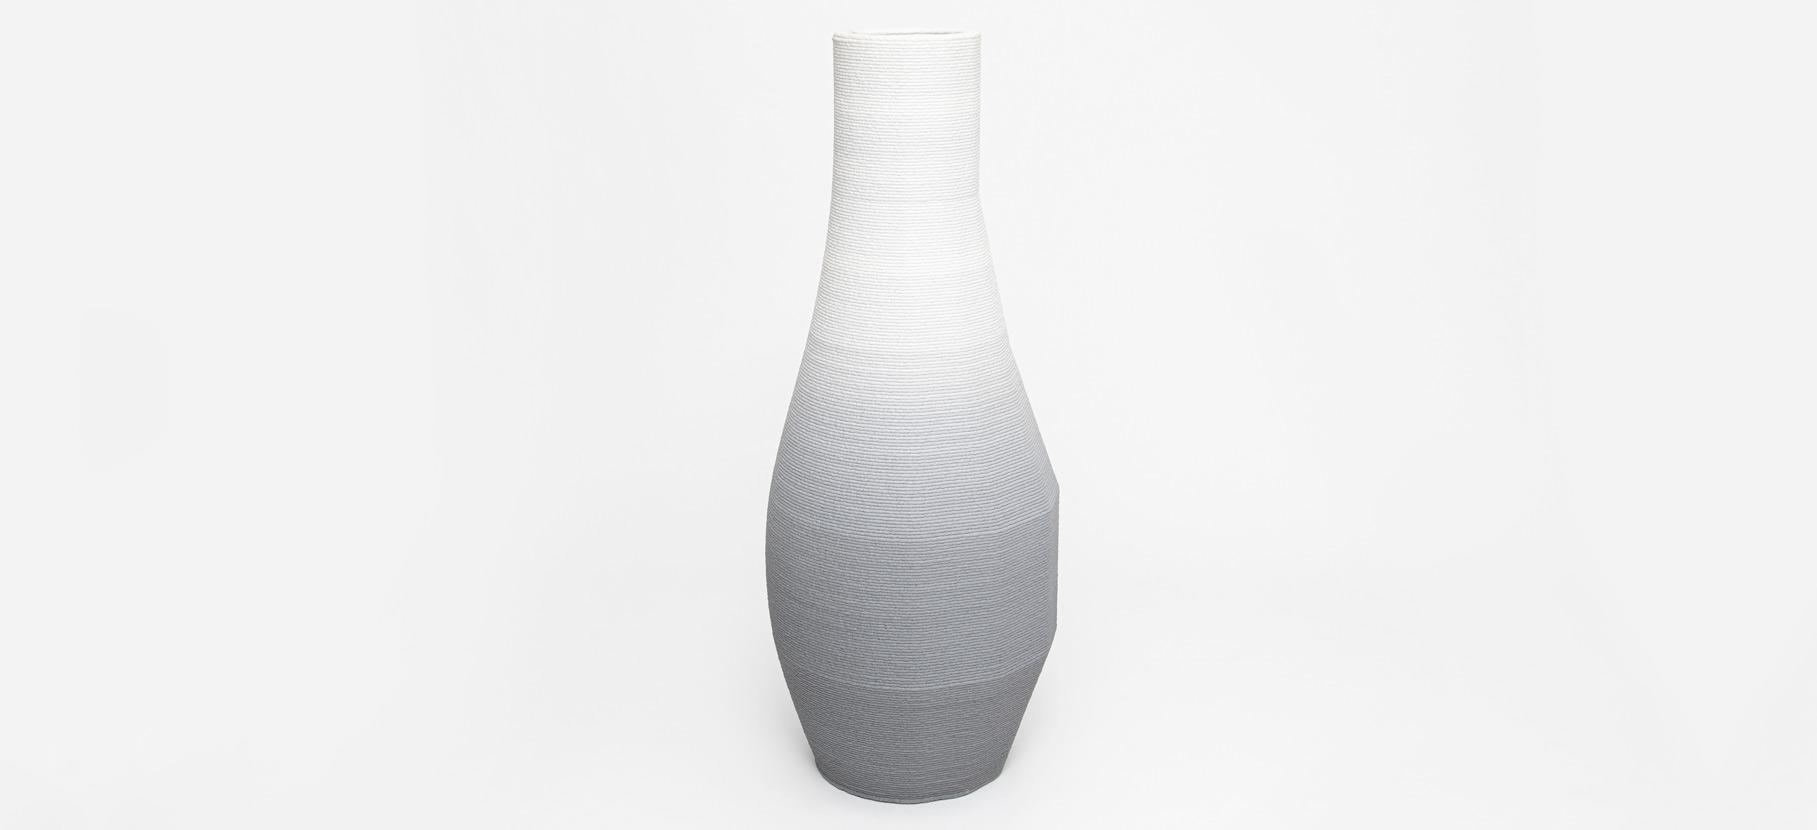 Gradient_Vase_Large_1